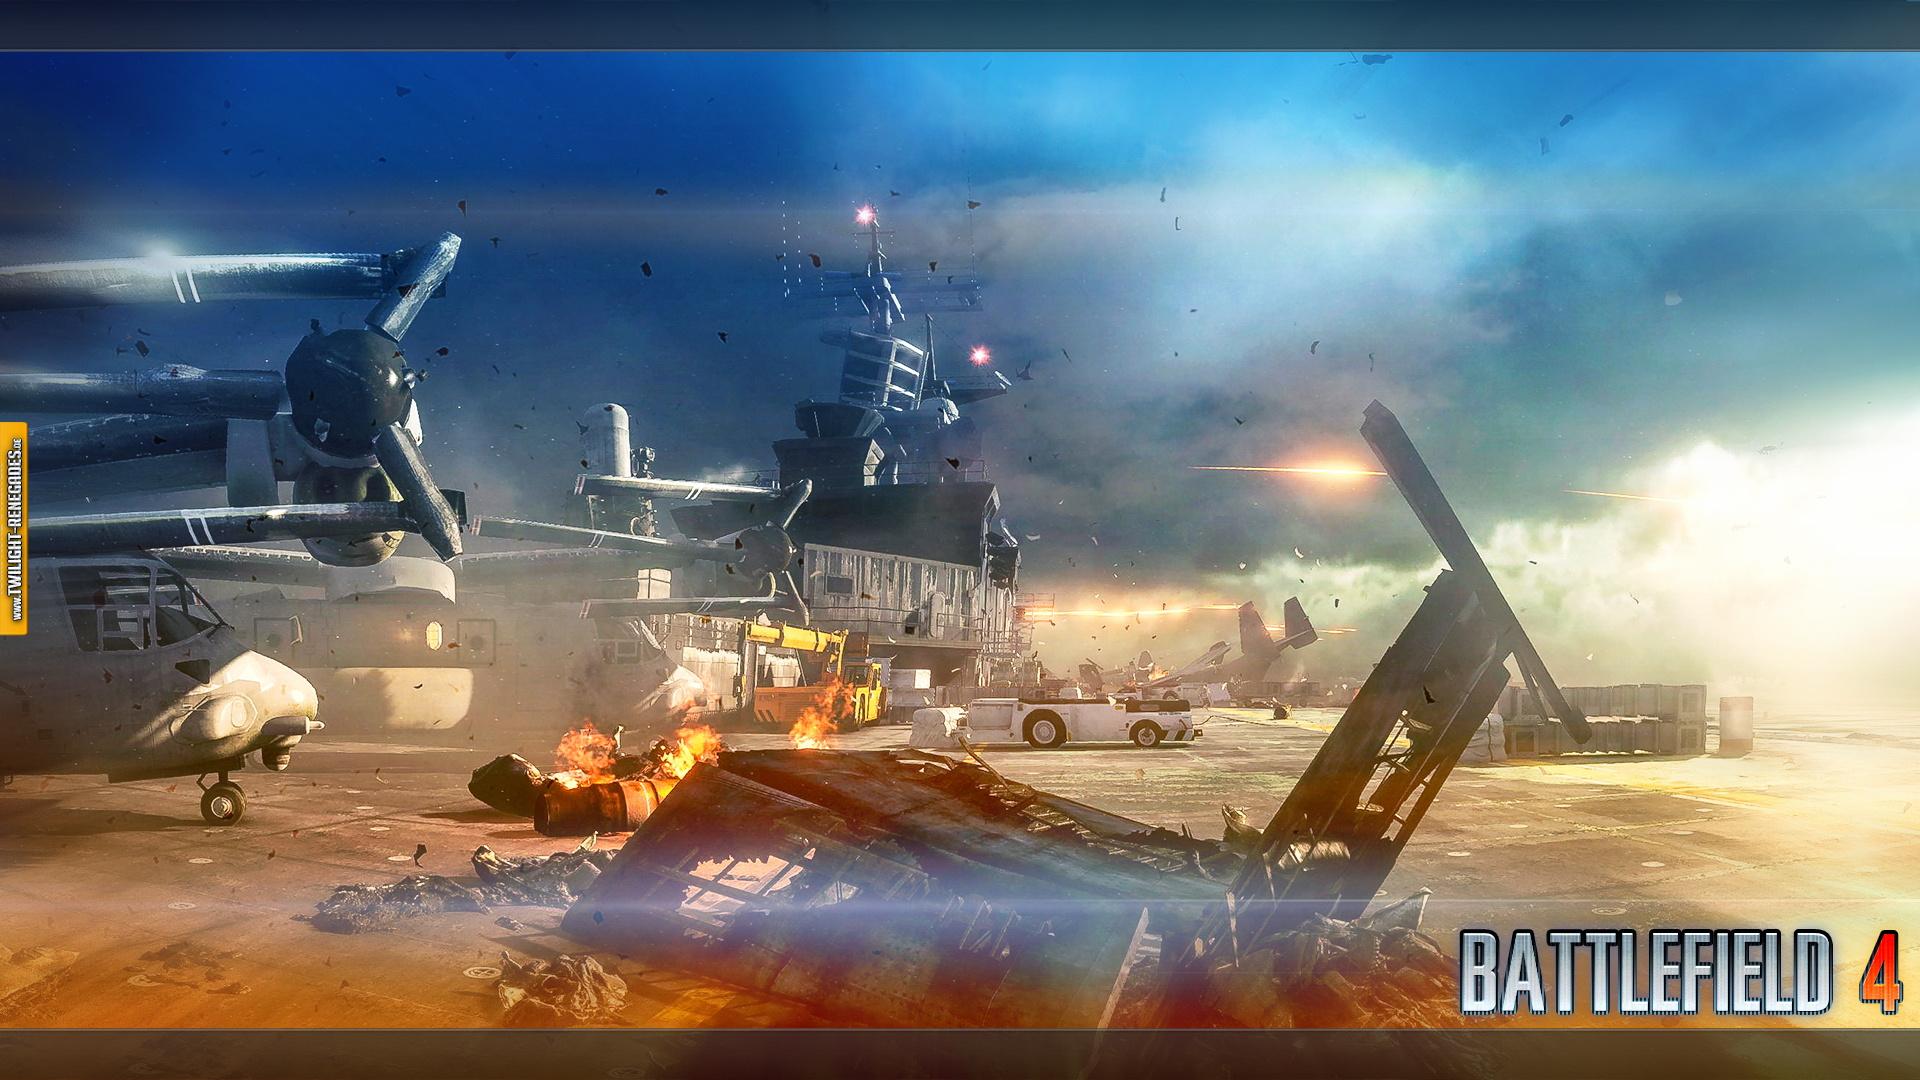 Mission Battlefield 031113